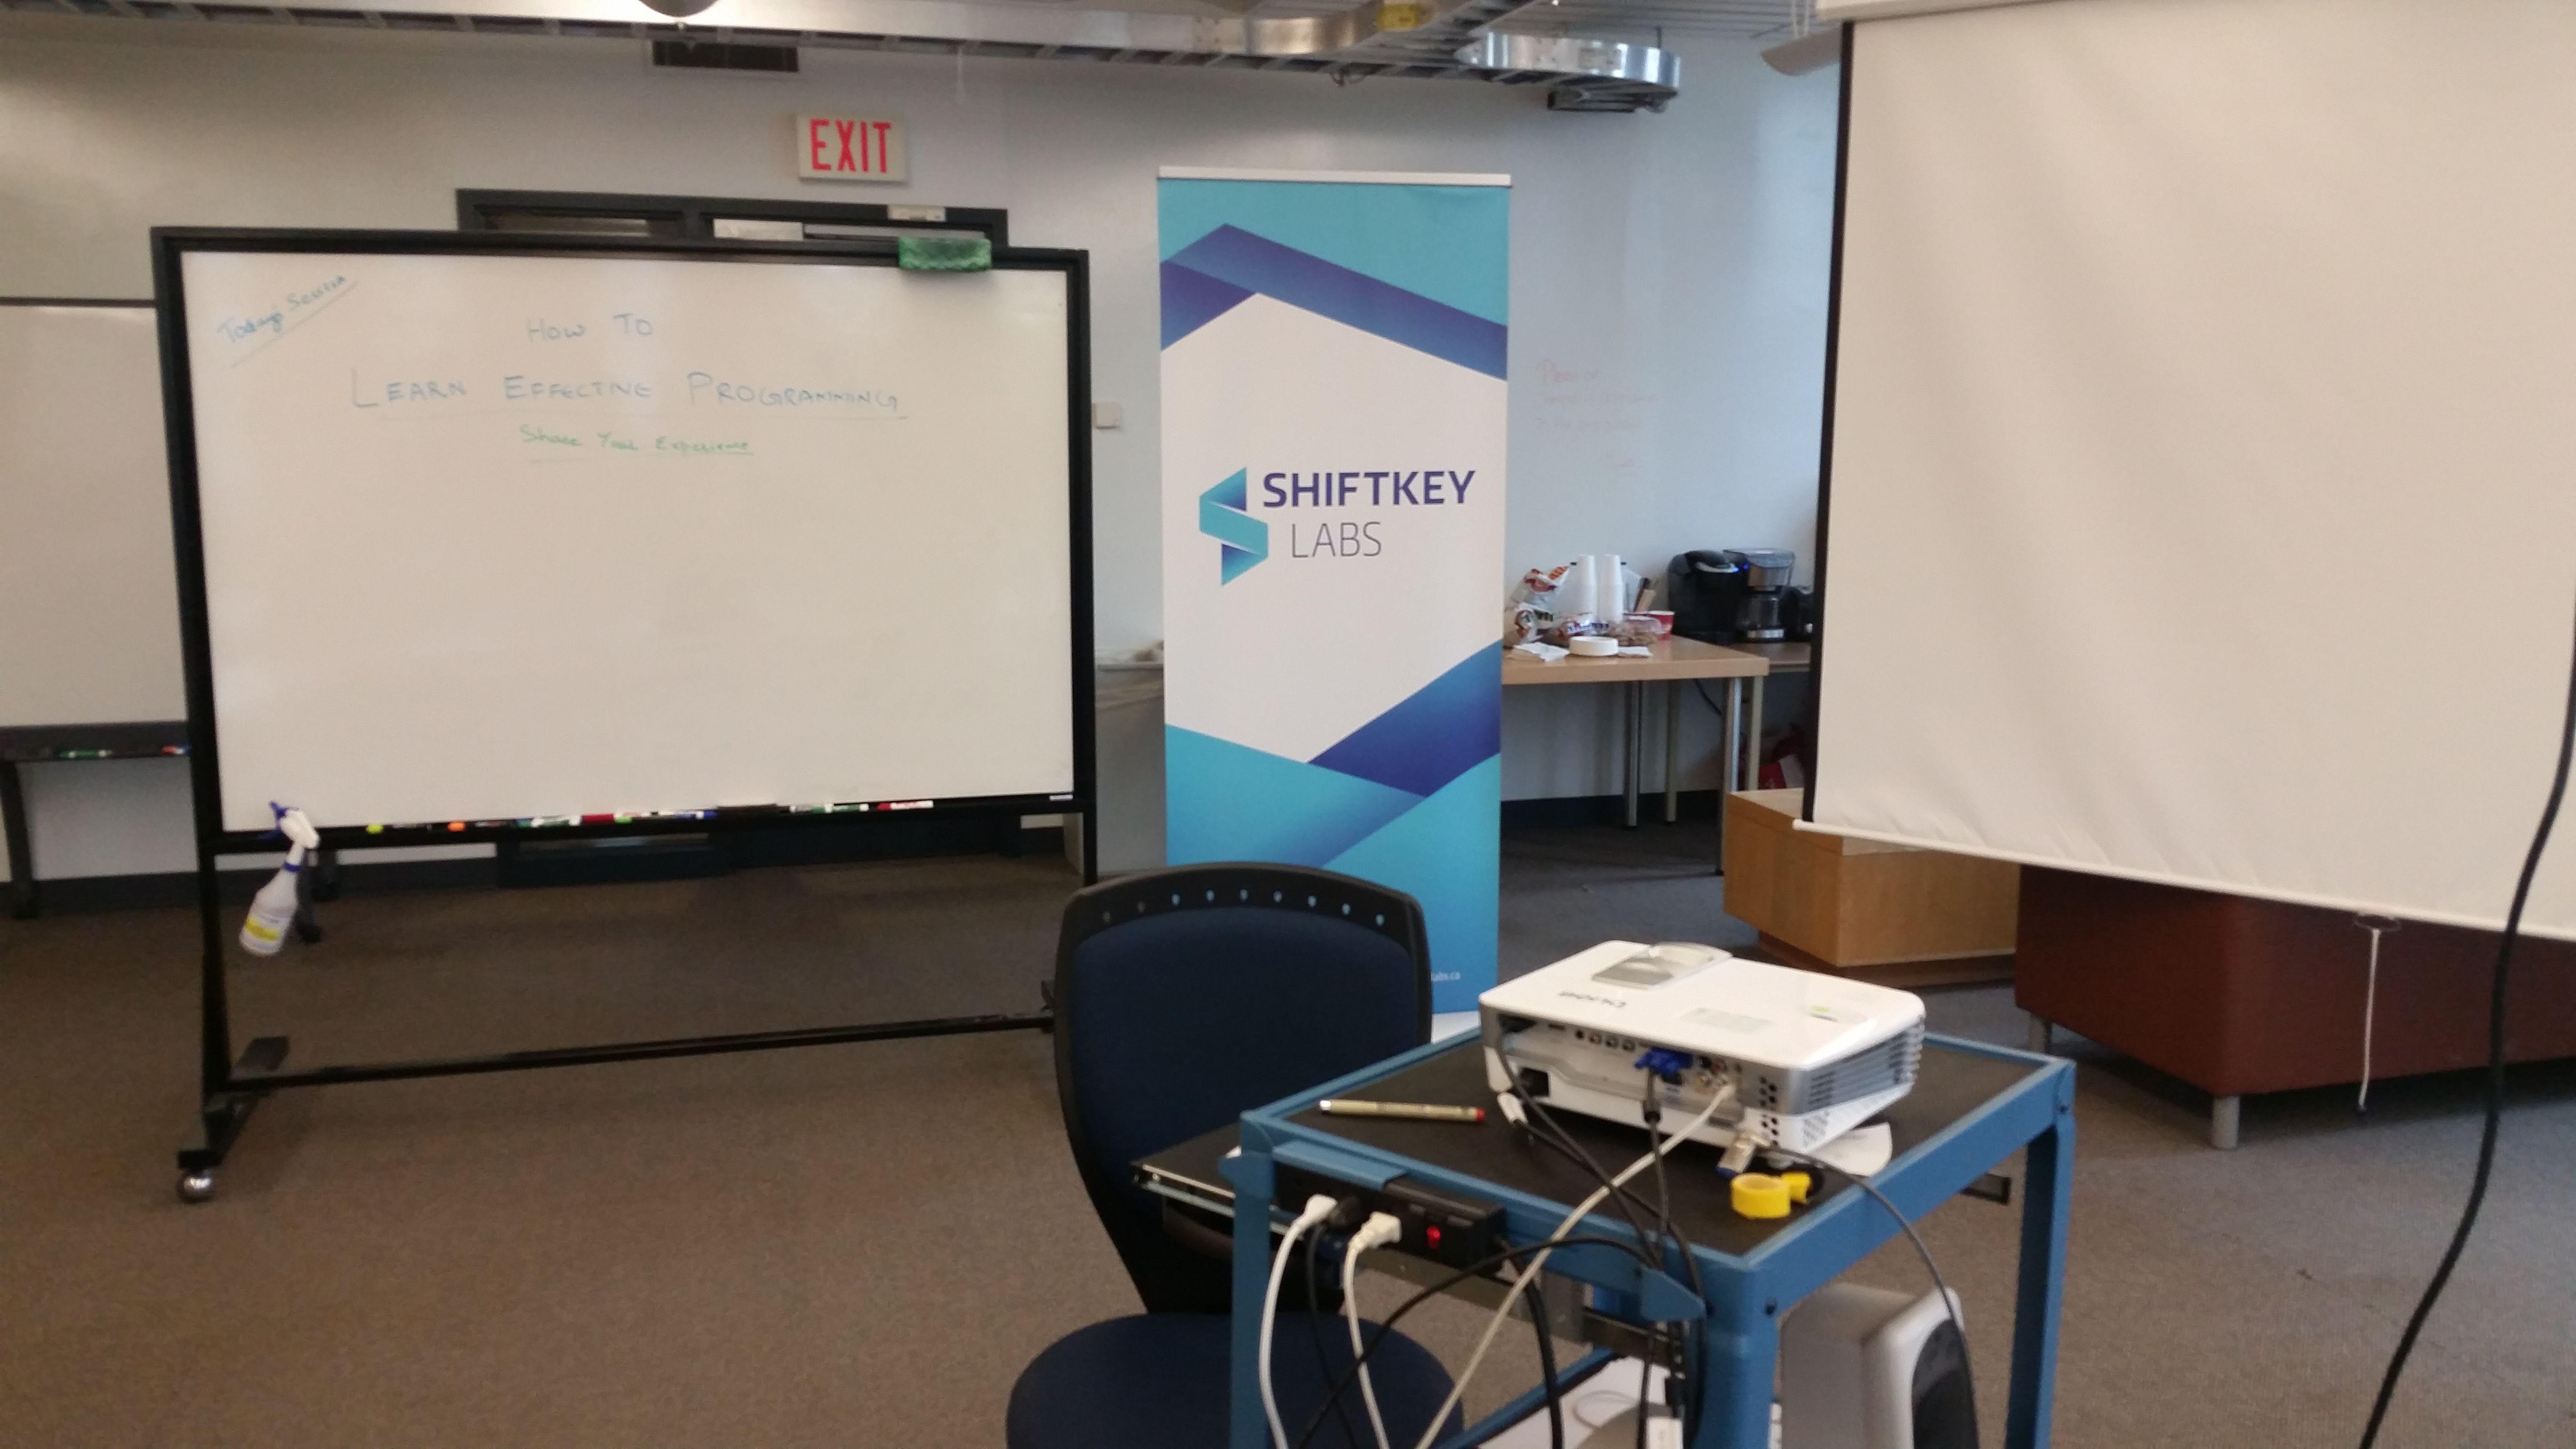 Halifax JavaScript + Emerging Web Meetup